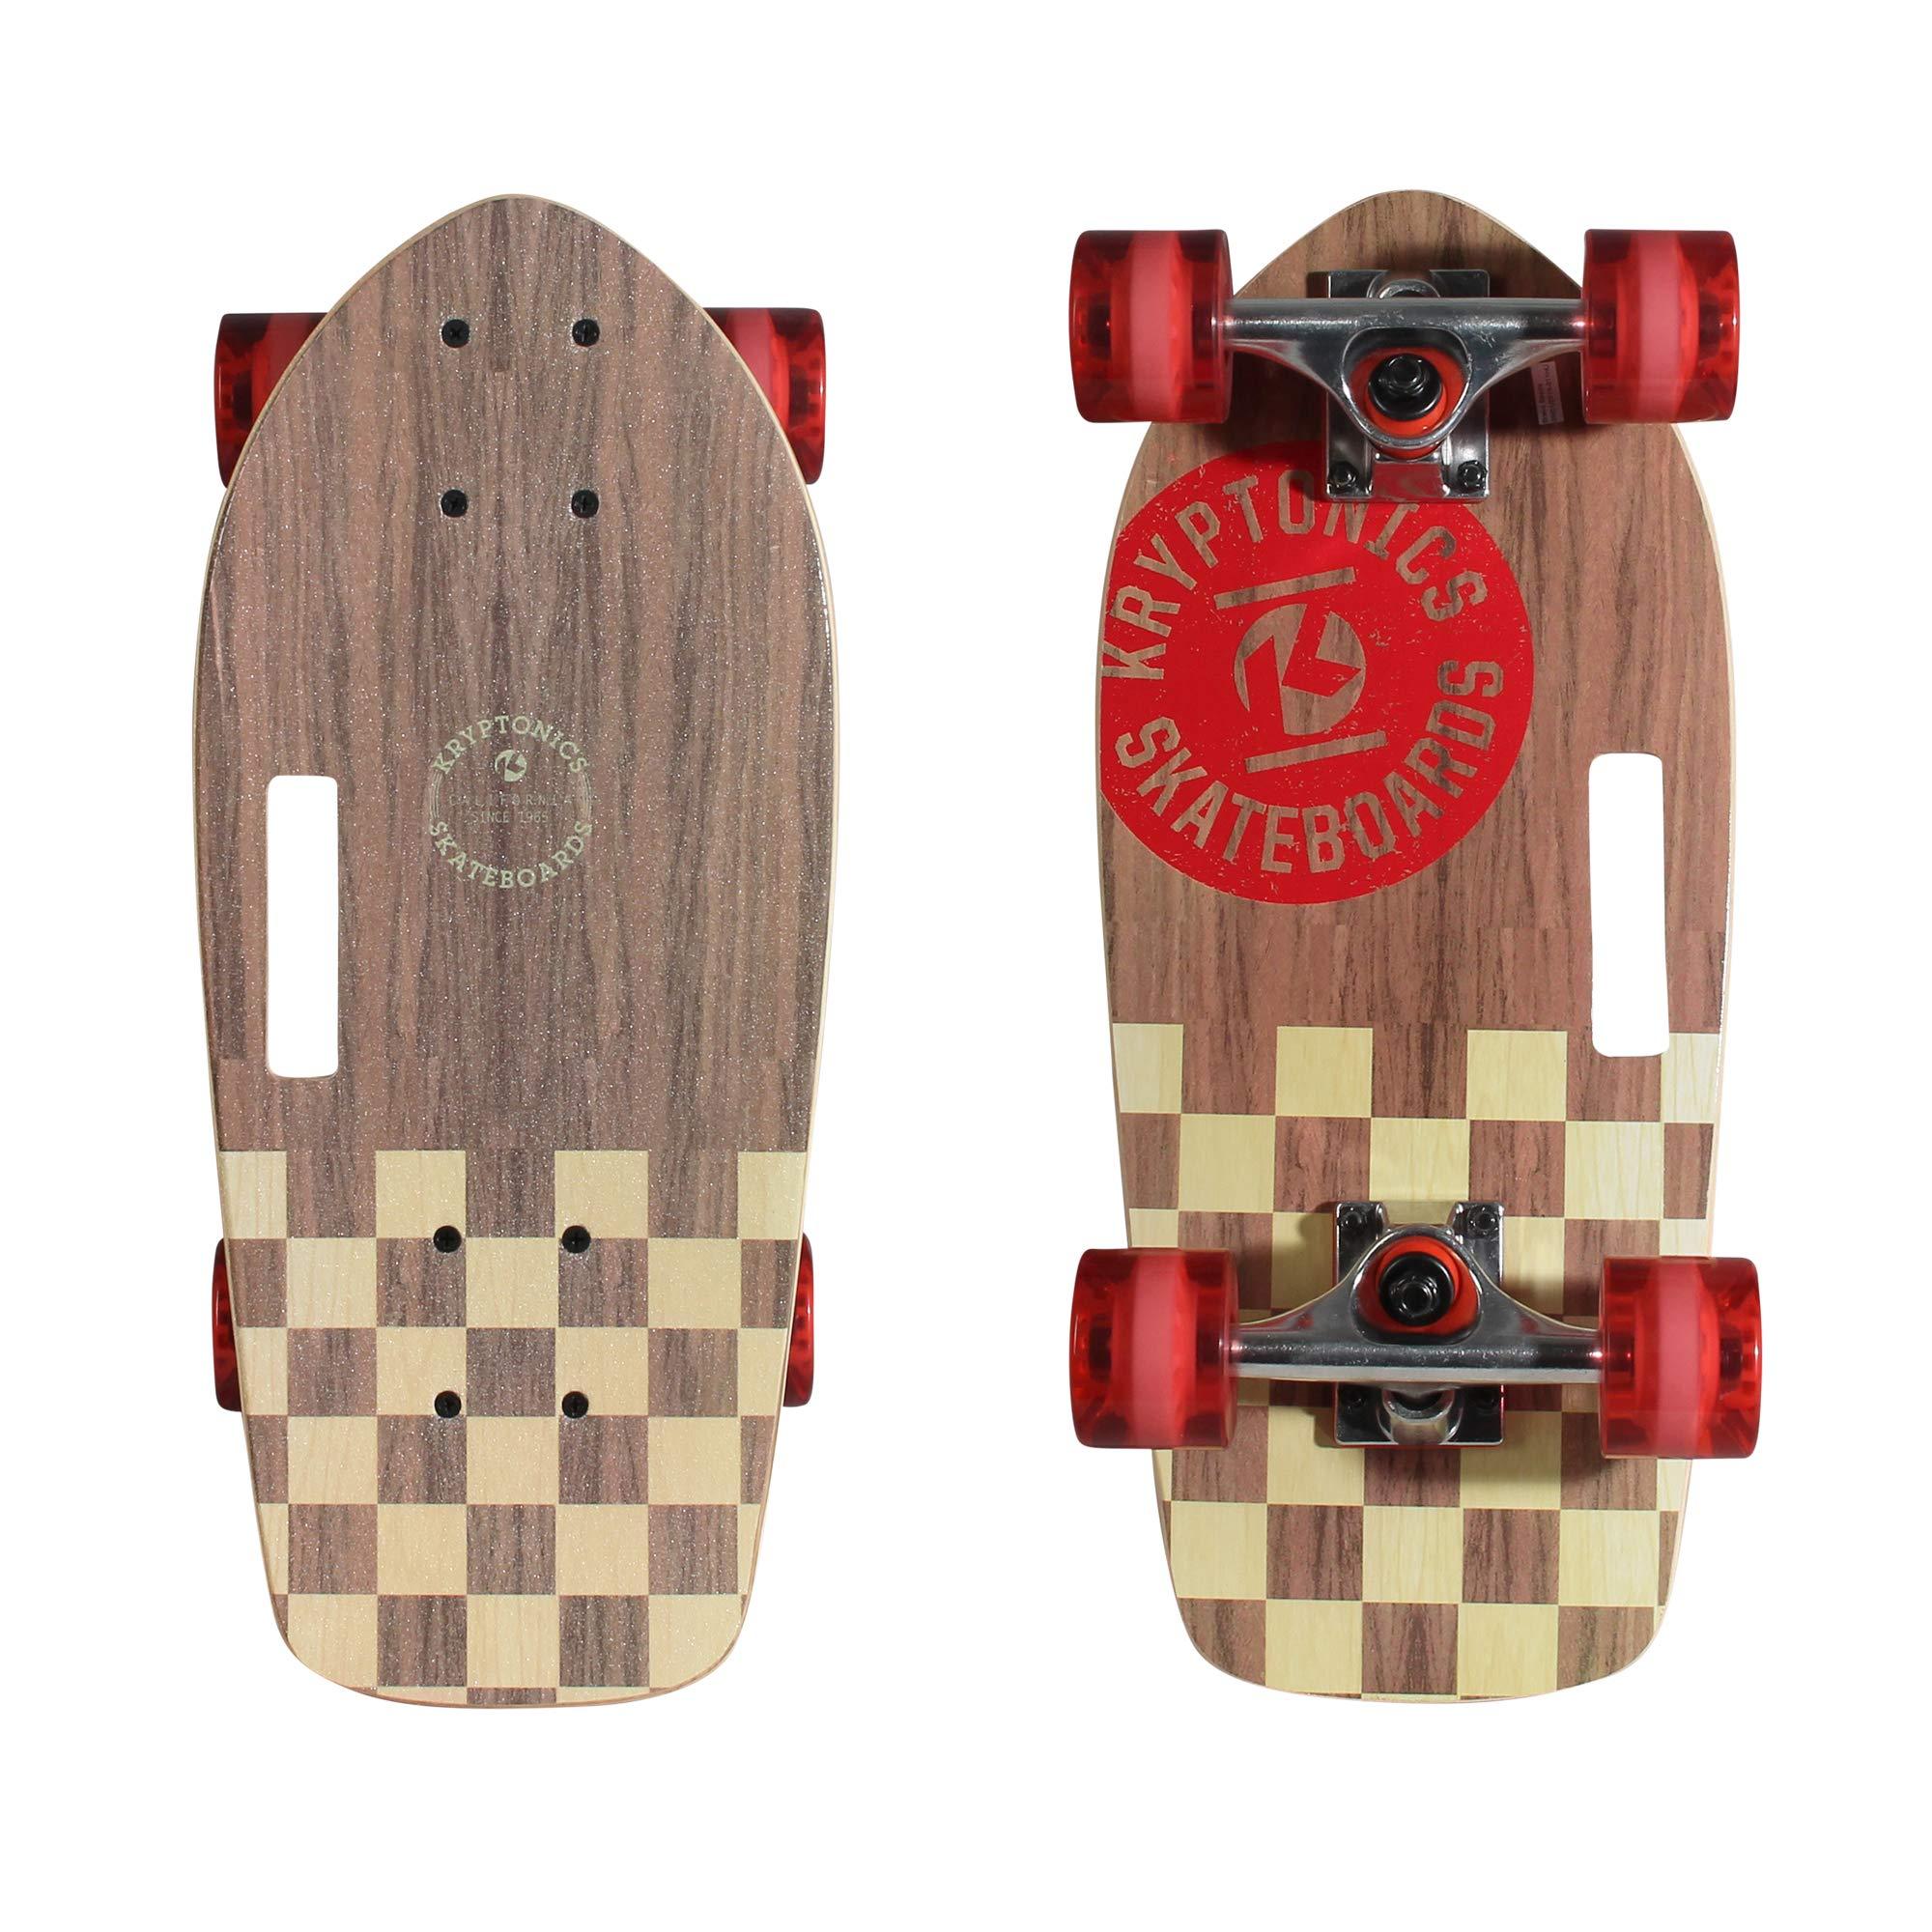 Kryptonics Stubby 19 Inch Complete Skateboard - Cali Authentic